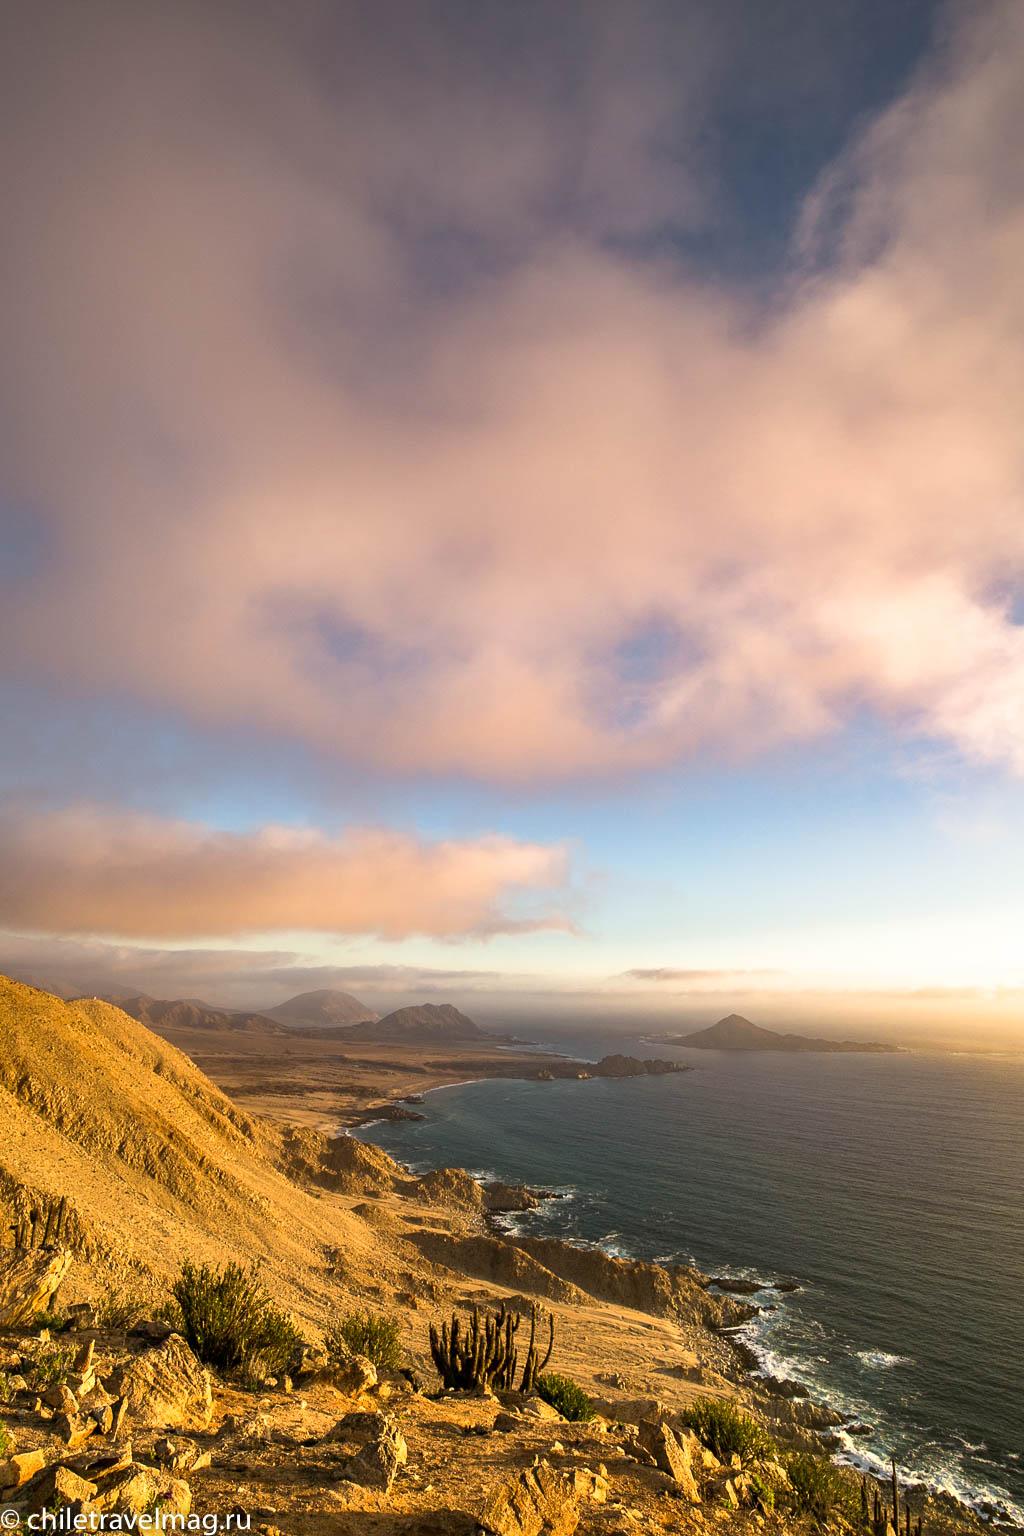 Парк Пан-де-Асукар, поездка в Чили22